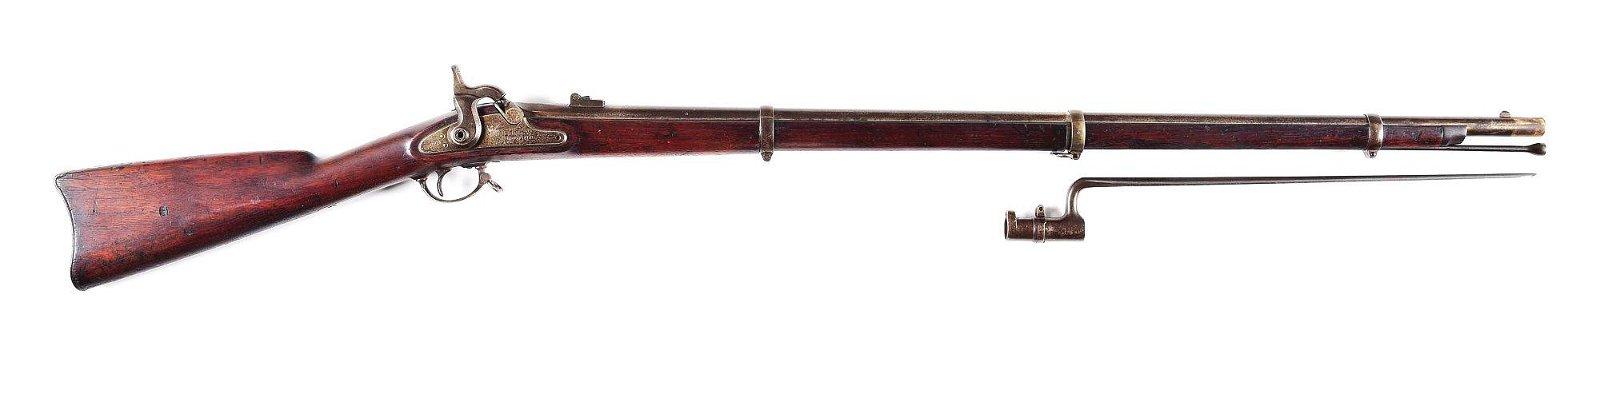 (A) US SPRINGFIELD 1863 PERCUSSION RIFLE.